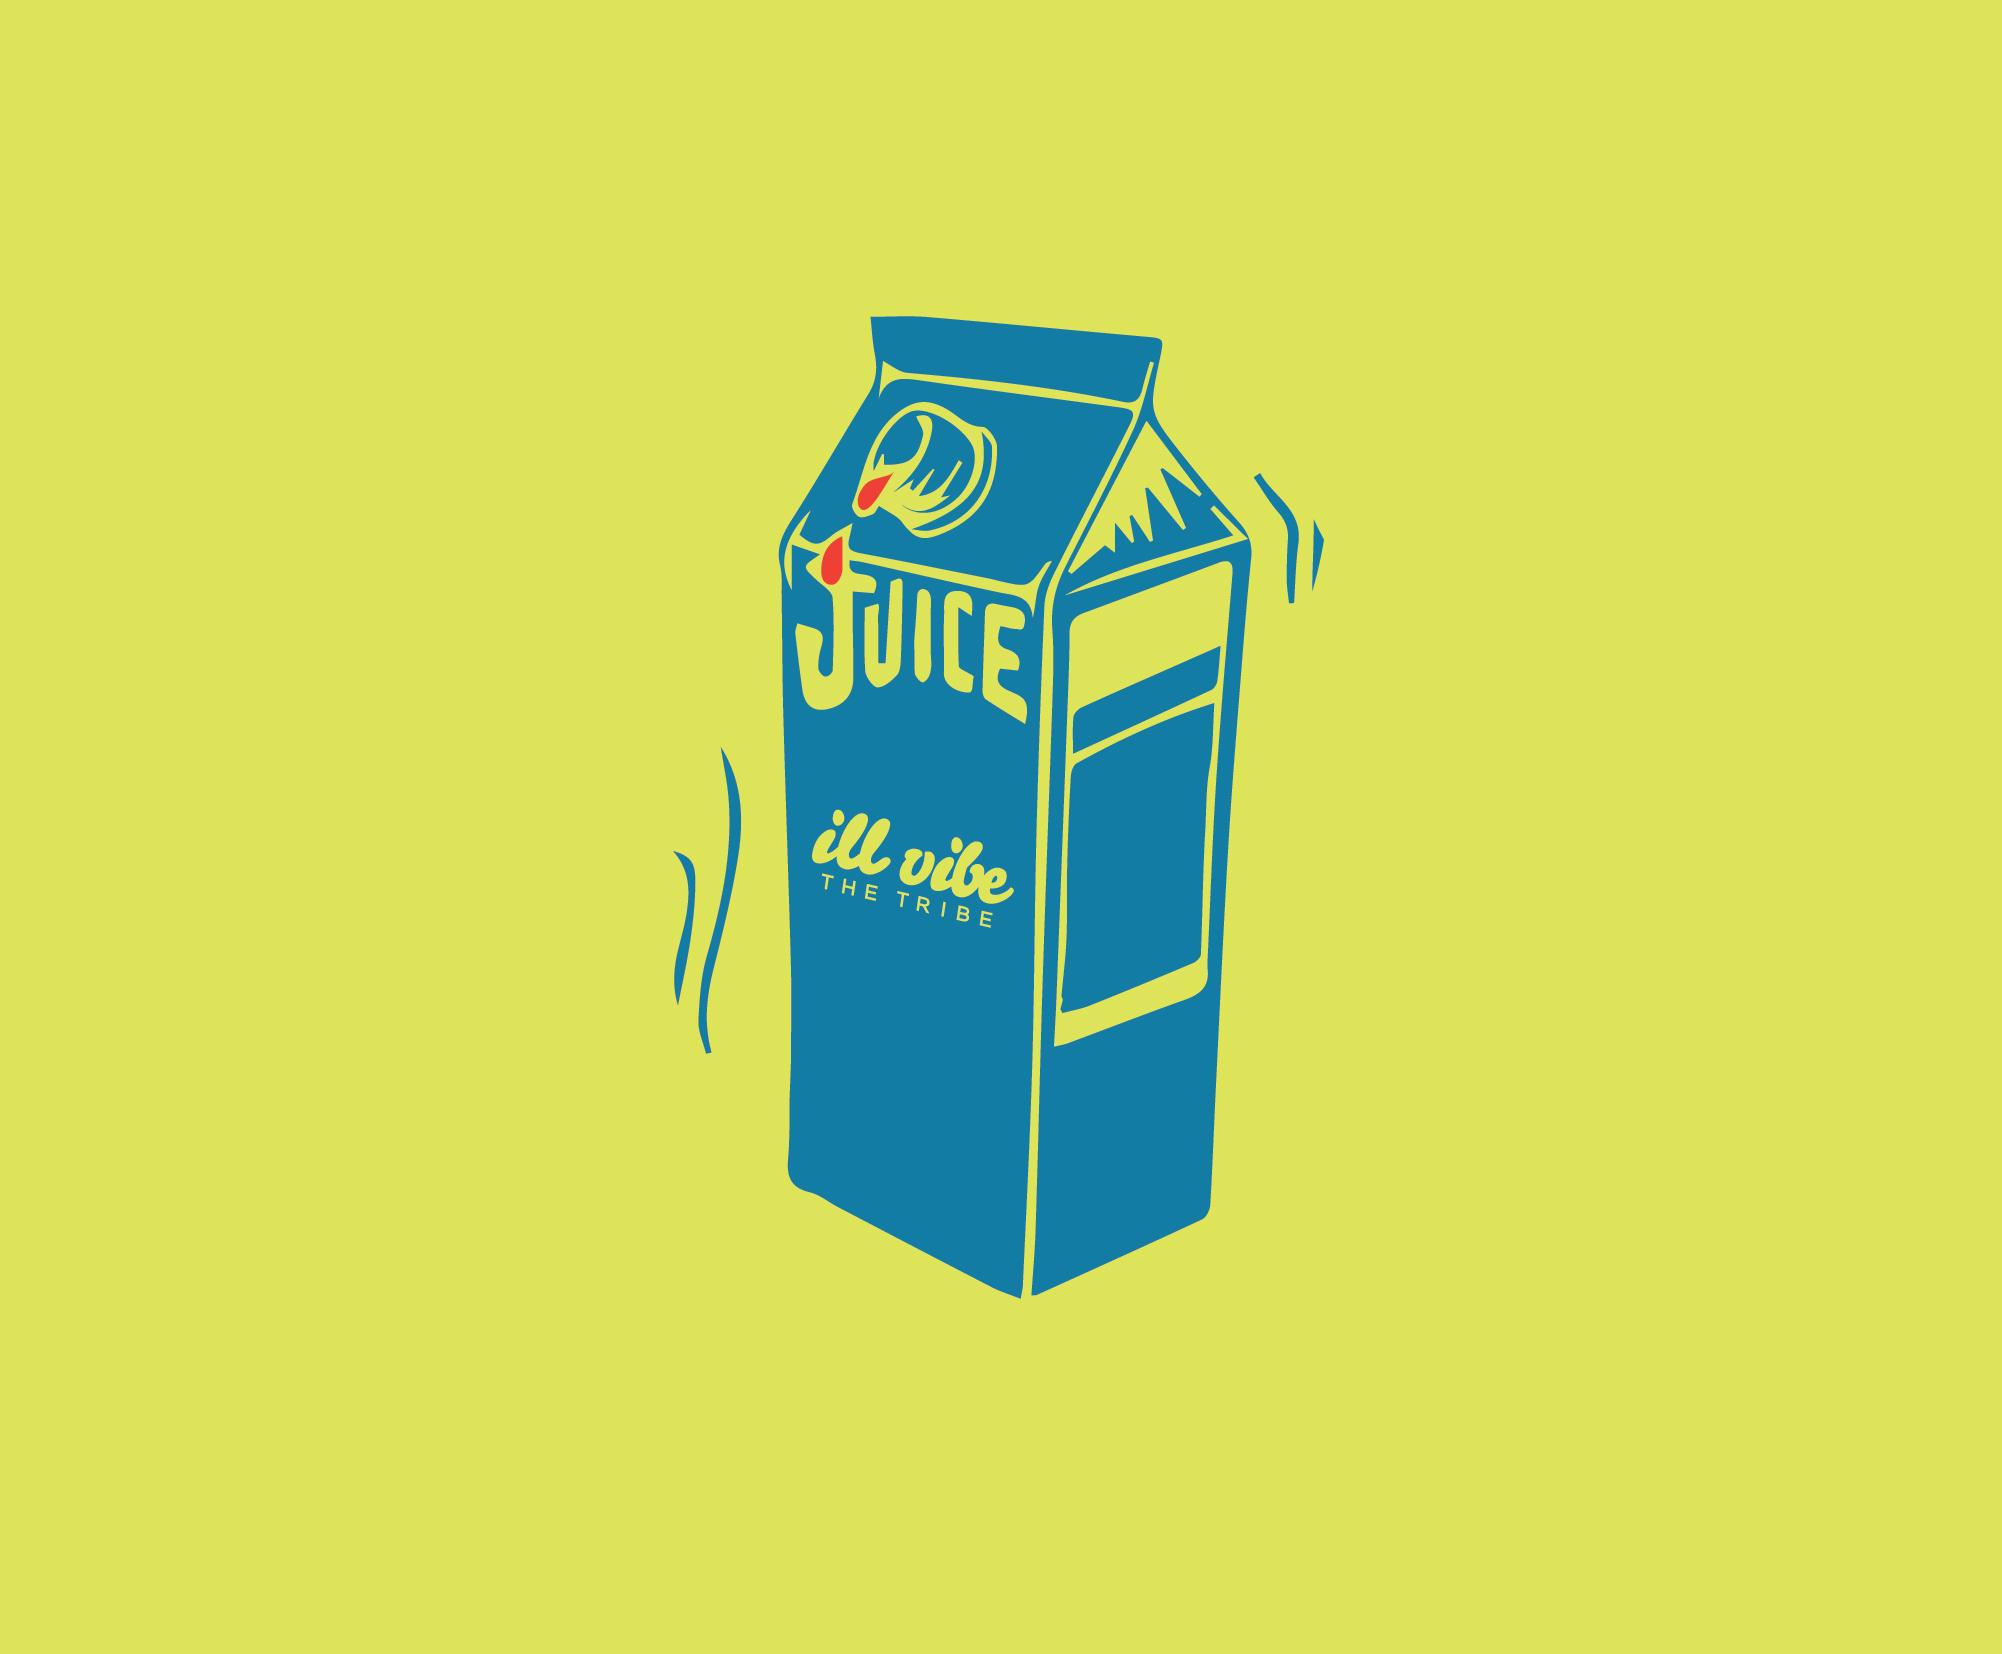 JuiceMonthly2.jpg